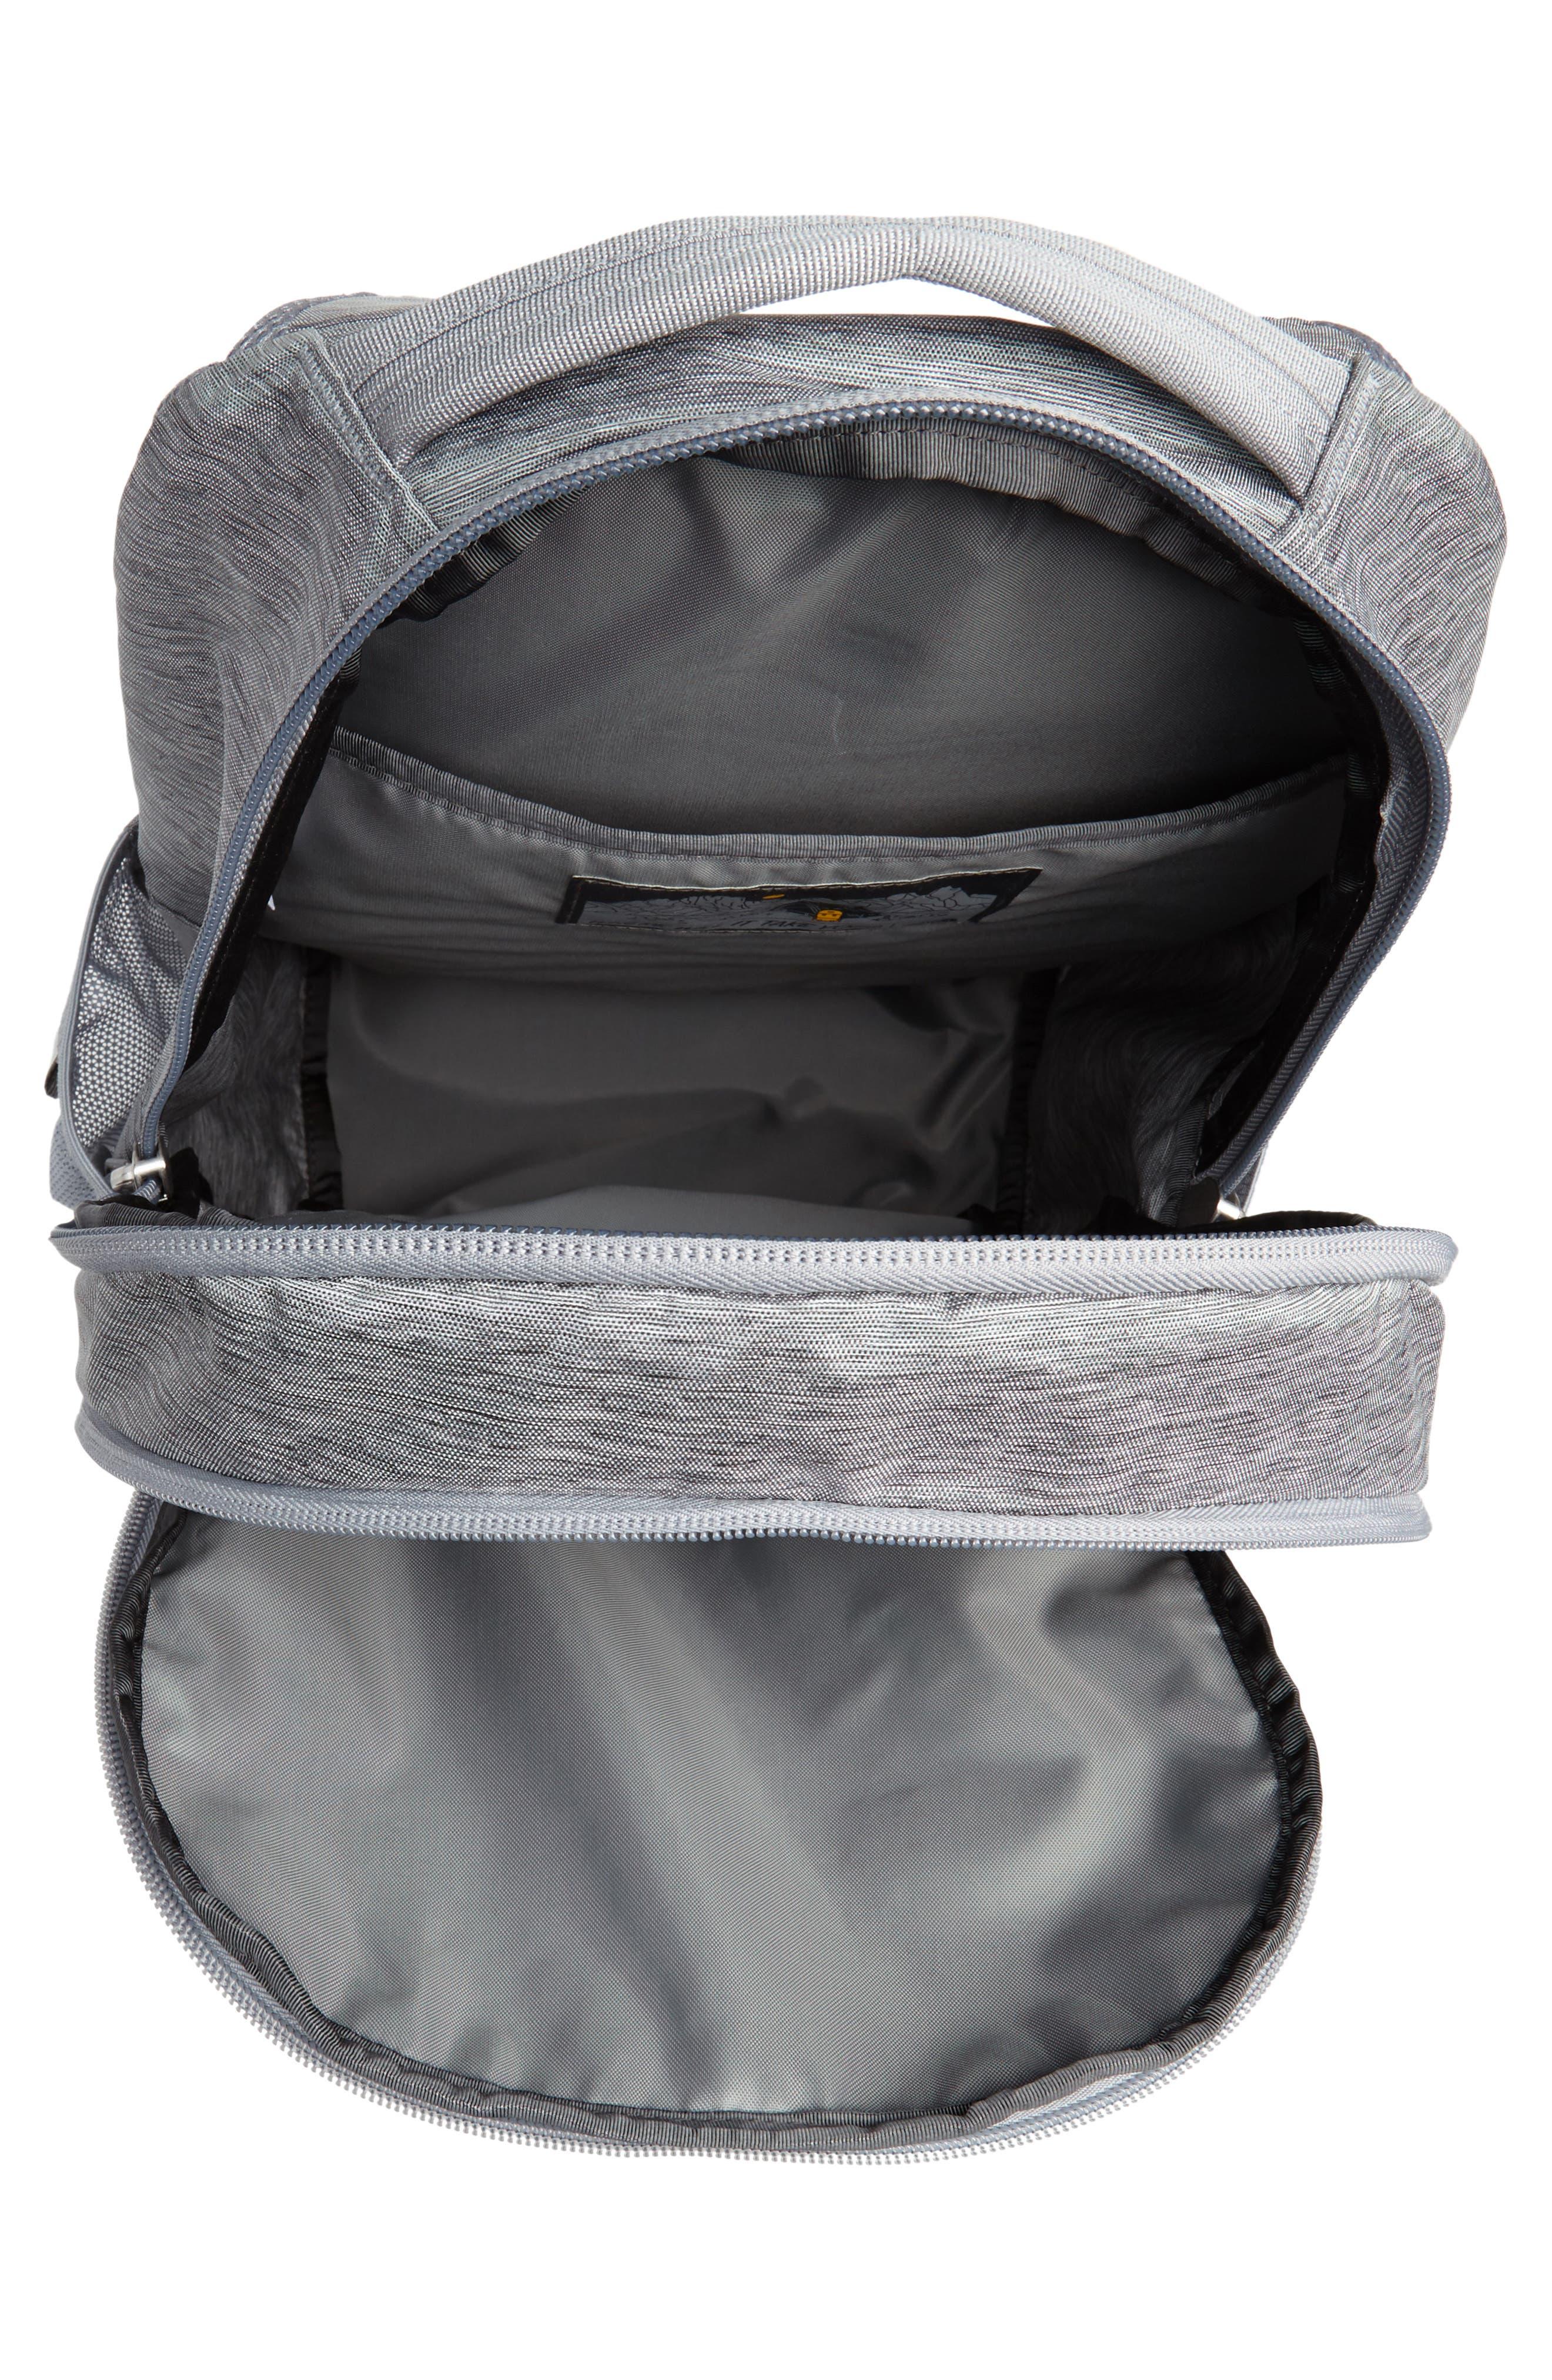 Jester Backpack,                             Alternate thumbnail 4, color,                             GREY DARK HEATHER/ TNF BLACK